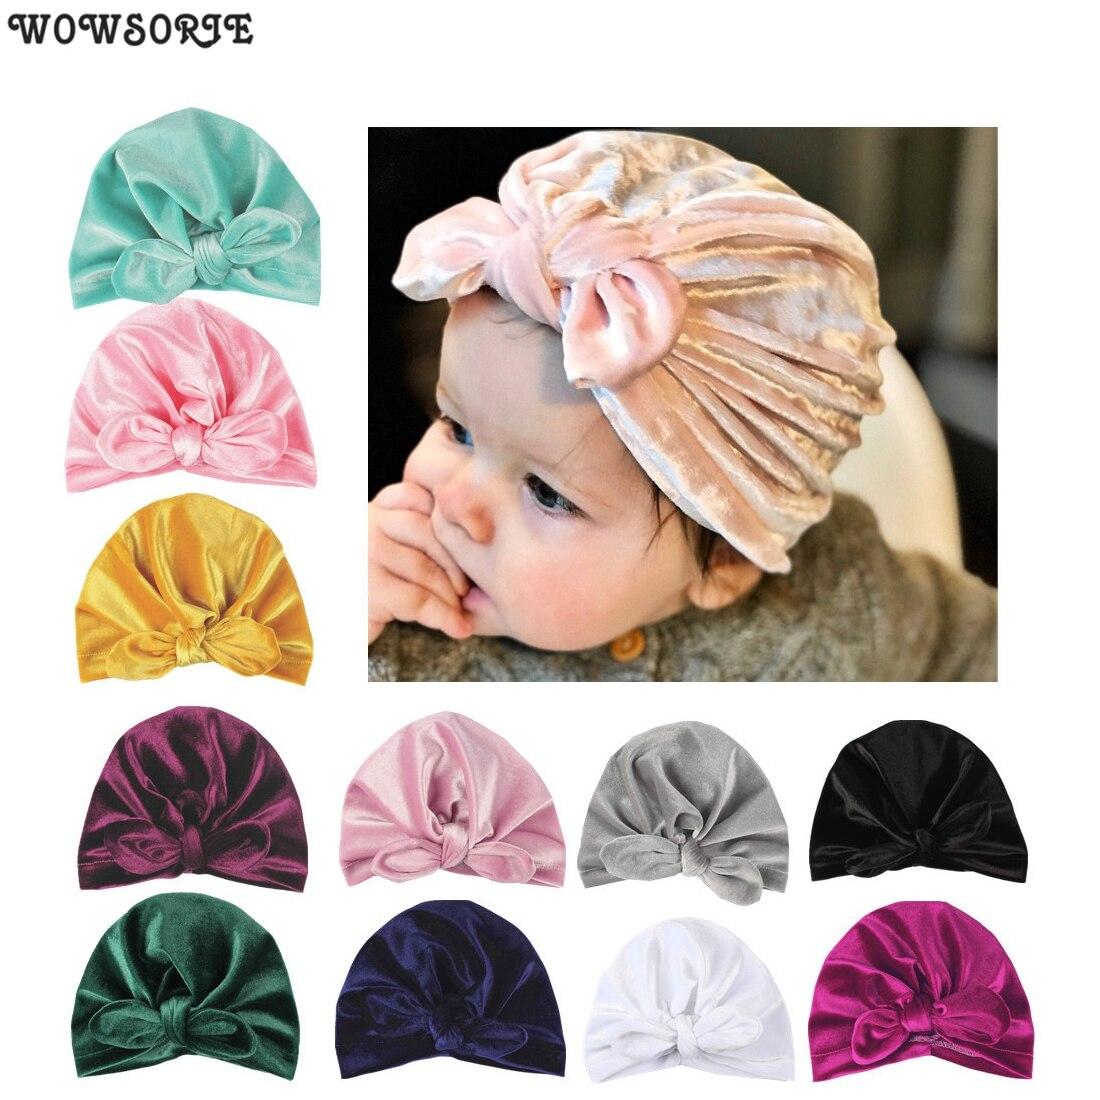 Toddler Baby Soft Velvet Winter Hats Indian Turban Caps Bohemia Style Head Wrap